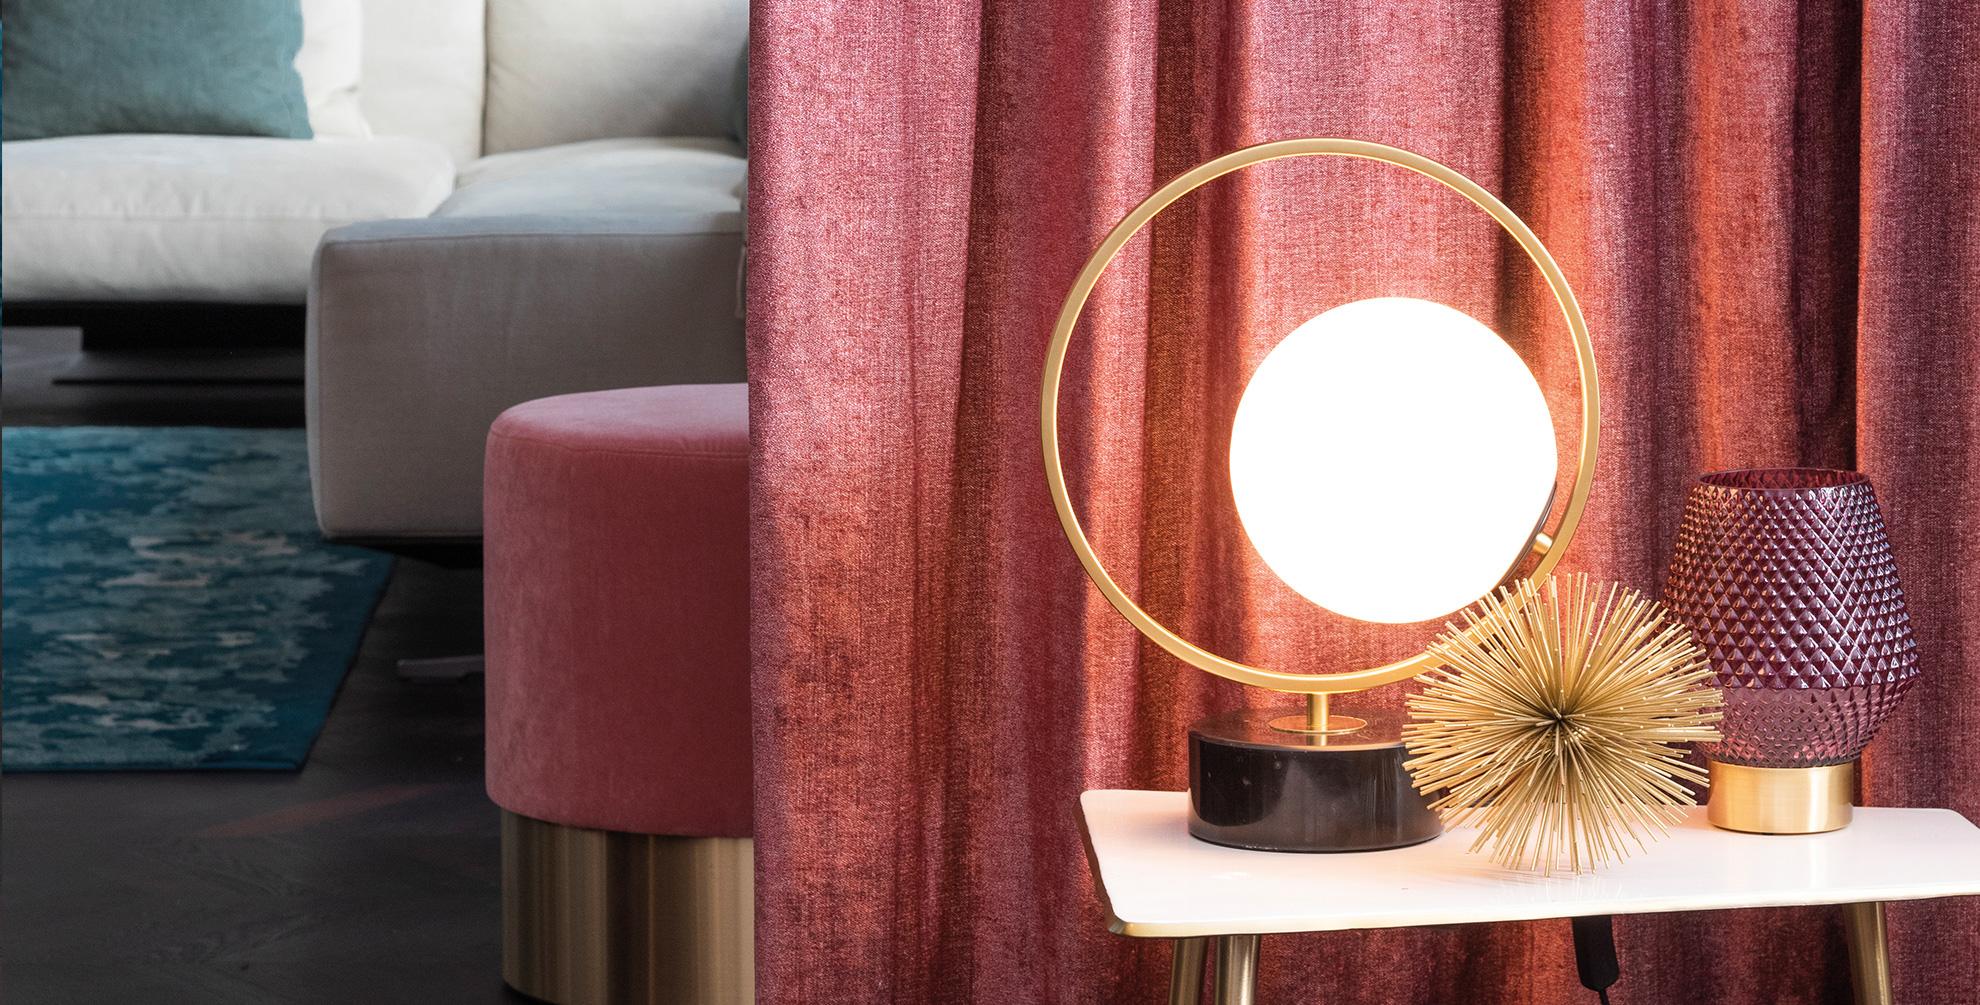 Sterren en lampjes voor twinkelende ramen